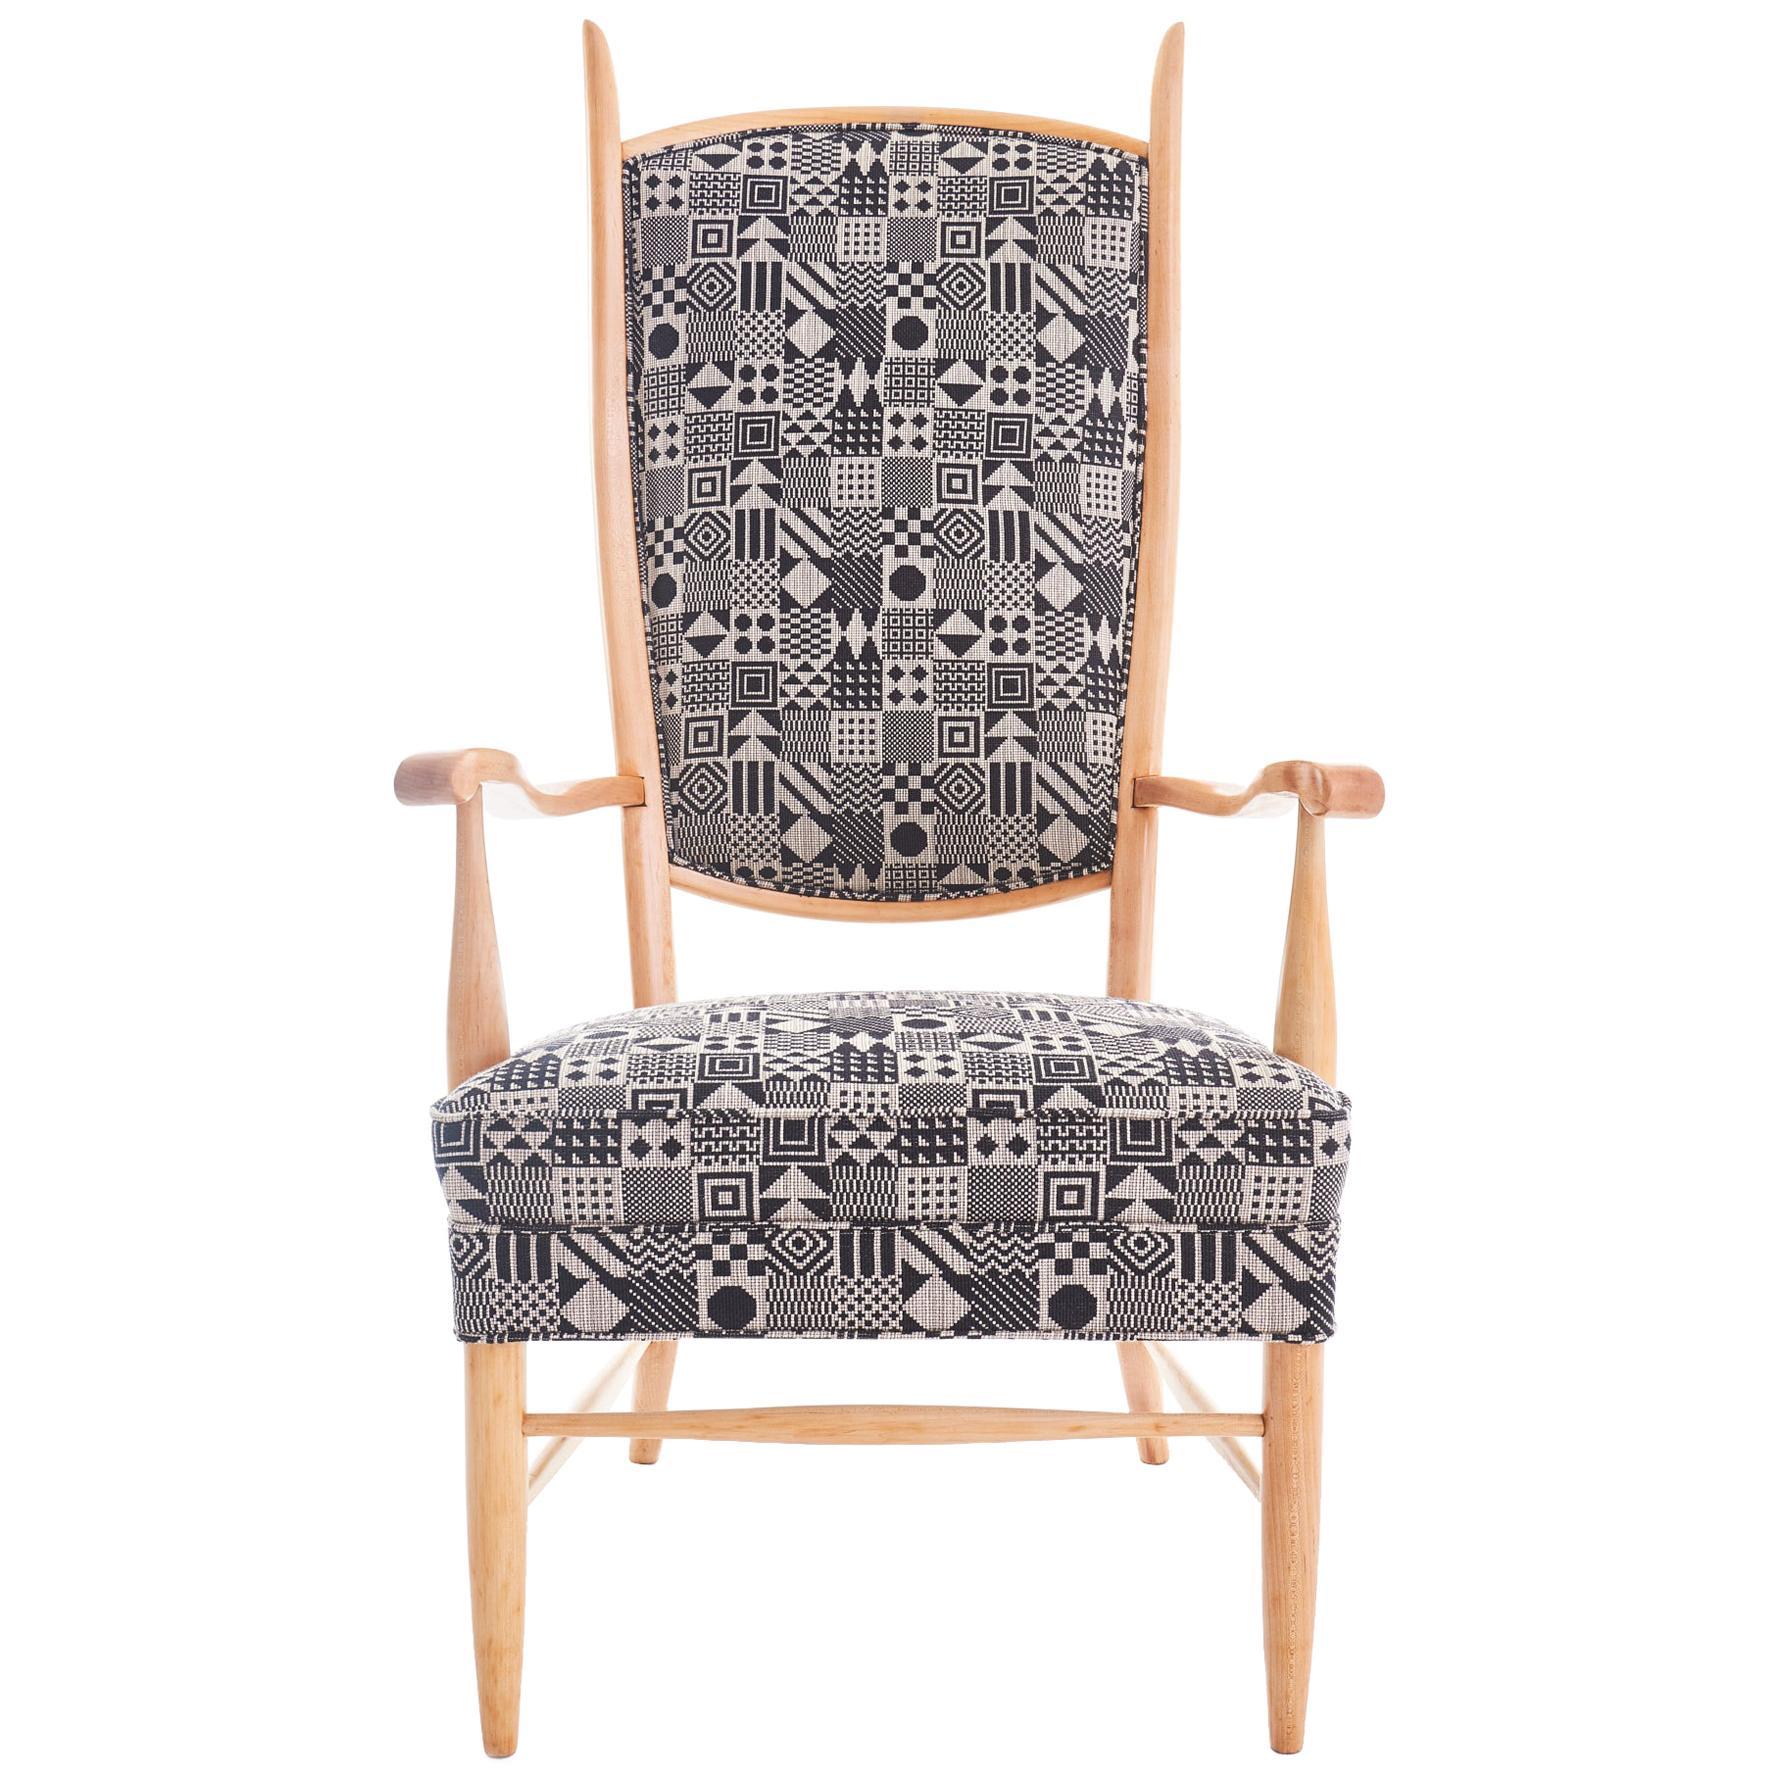 Midcentury Maxwell Royal Chair Company High Back Armchair